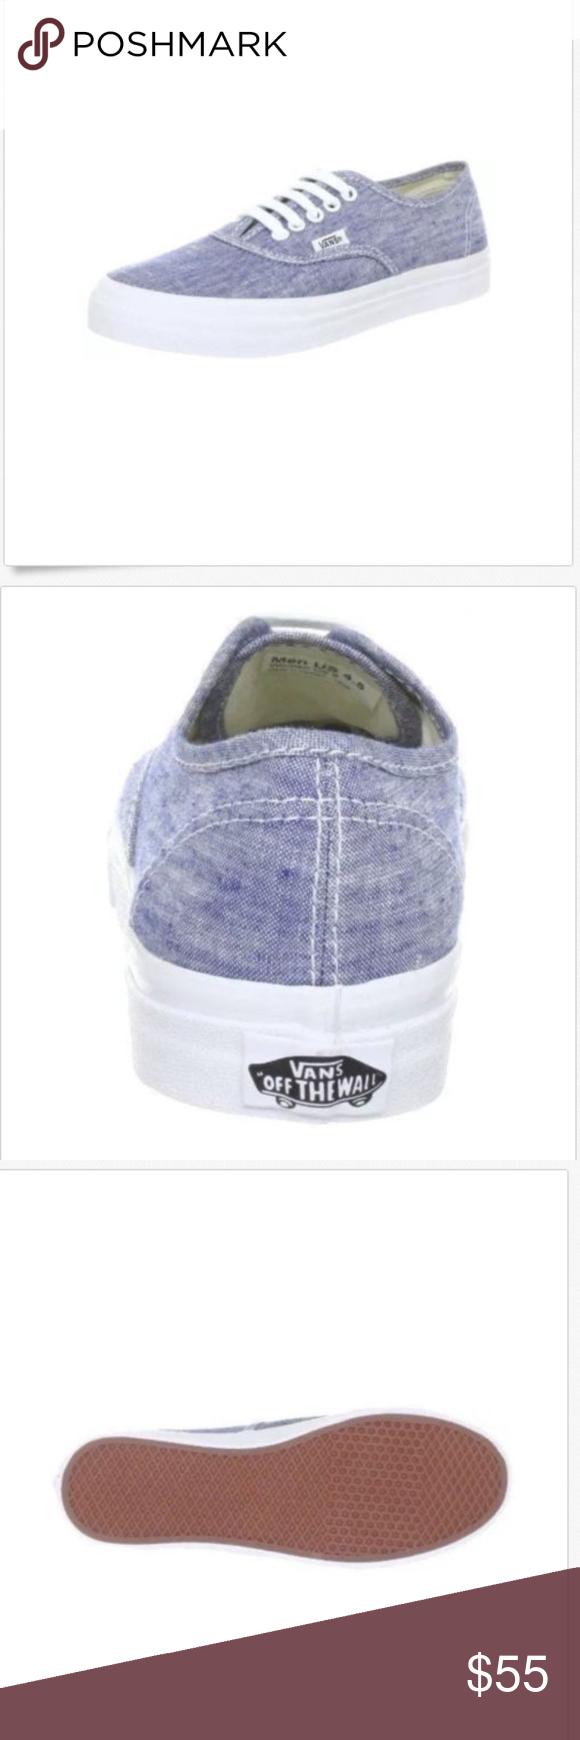 9fbfa88a7a Vans Authentic Slim Chambray Blue True White Shoes Vans Authentic Slim  Chambray Blue True White Shoes Size Men 8.5 Women 10 Brand New In Box Vans  Shoes ...